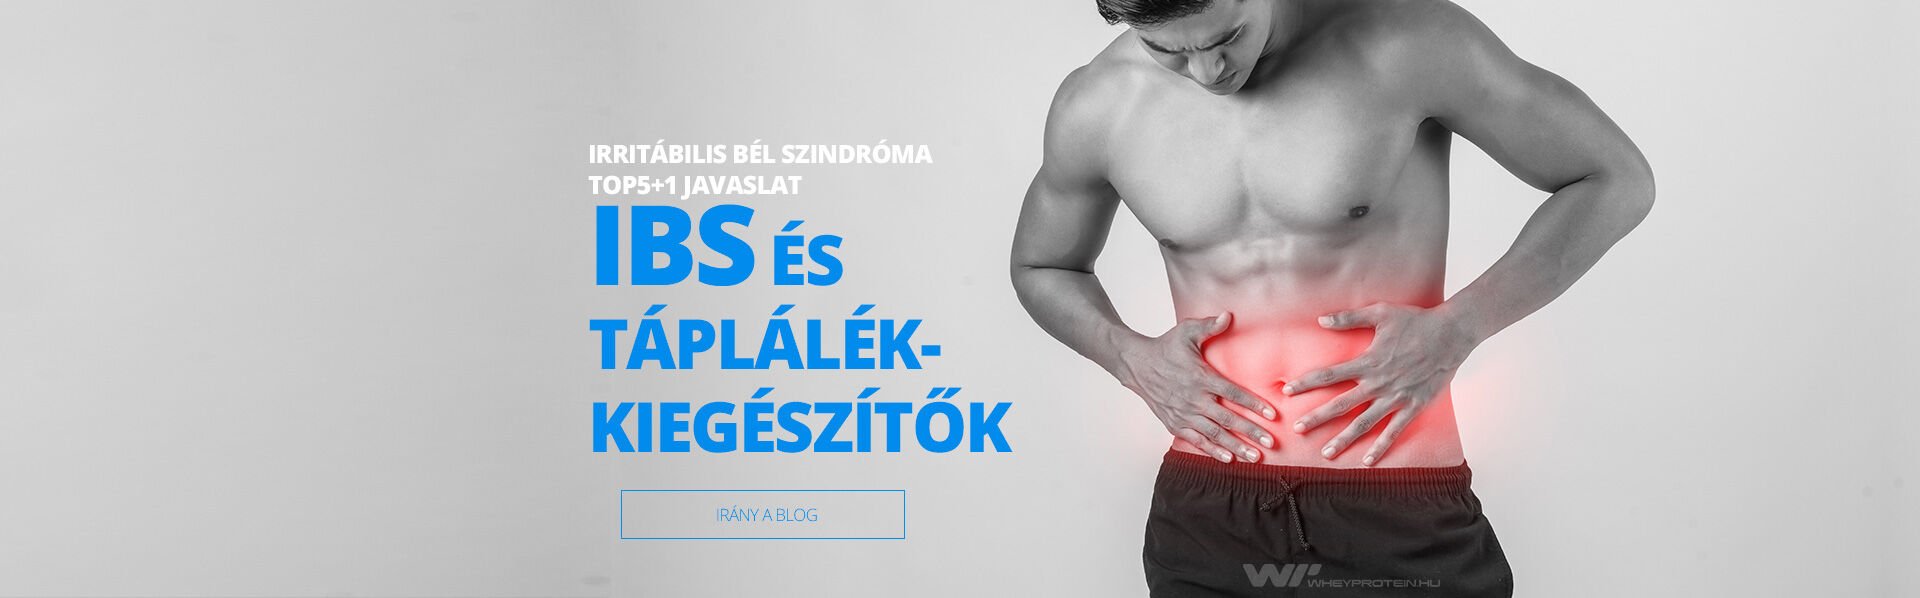 IBS - Blog